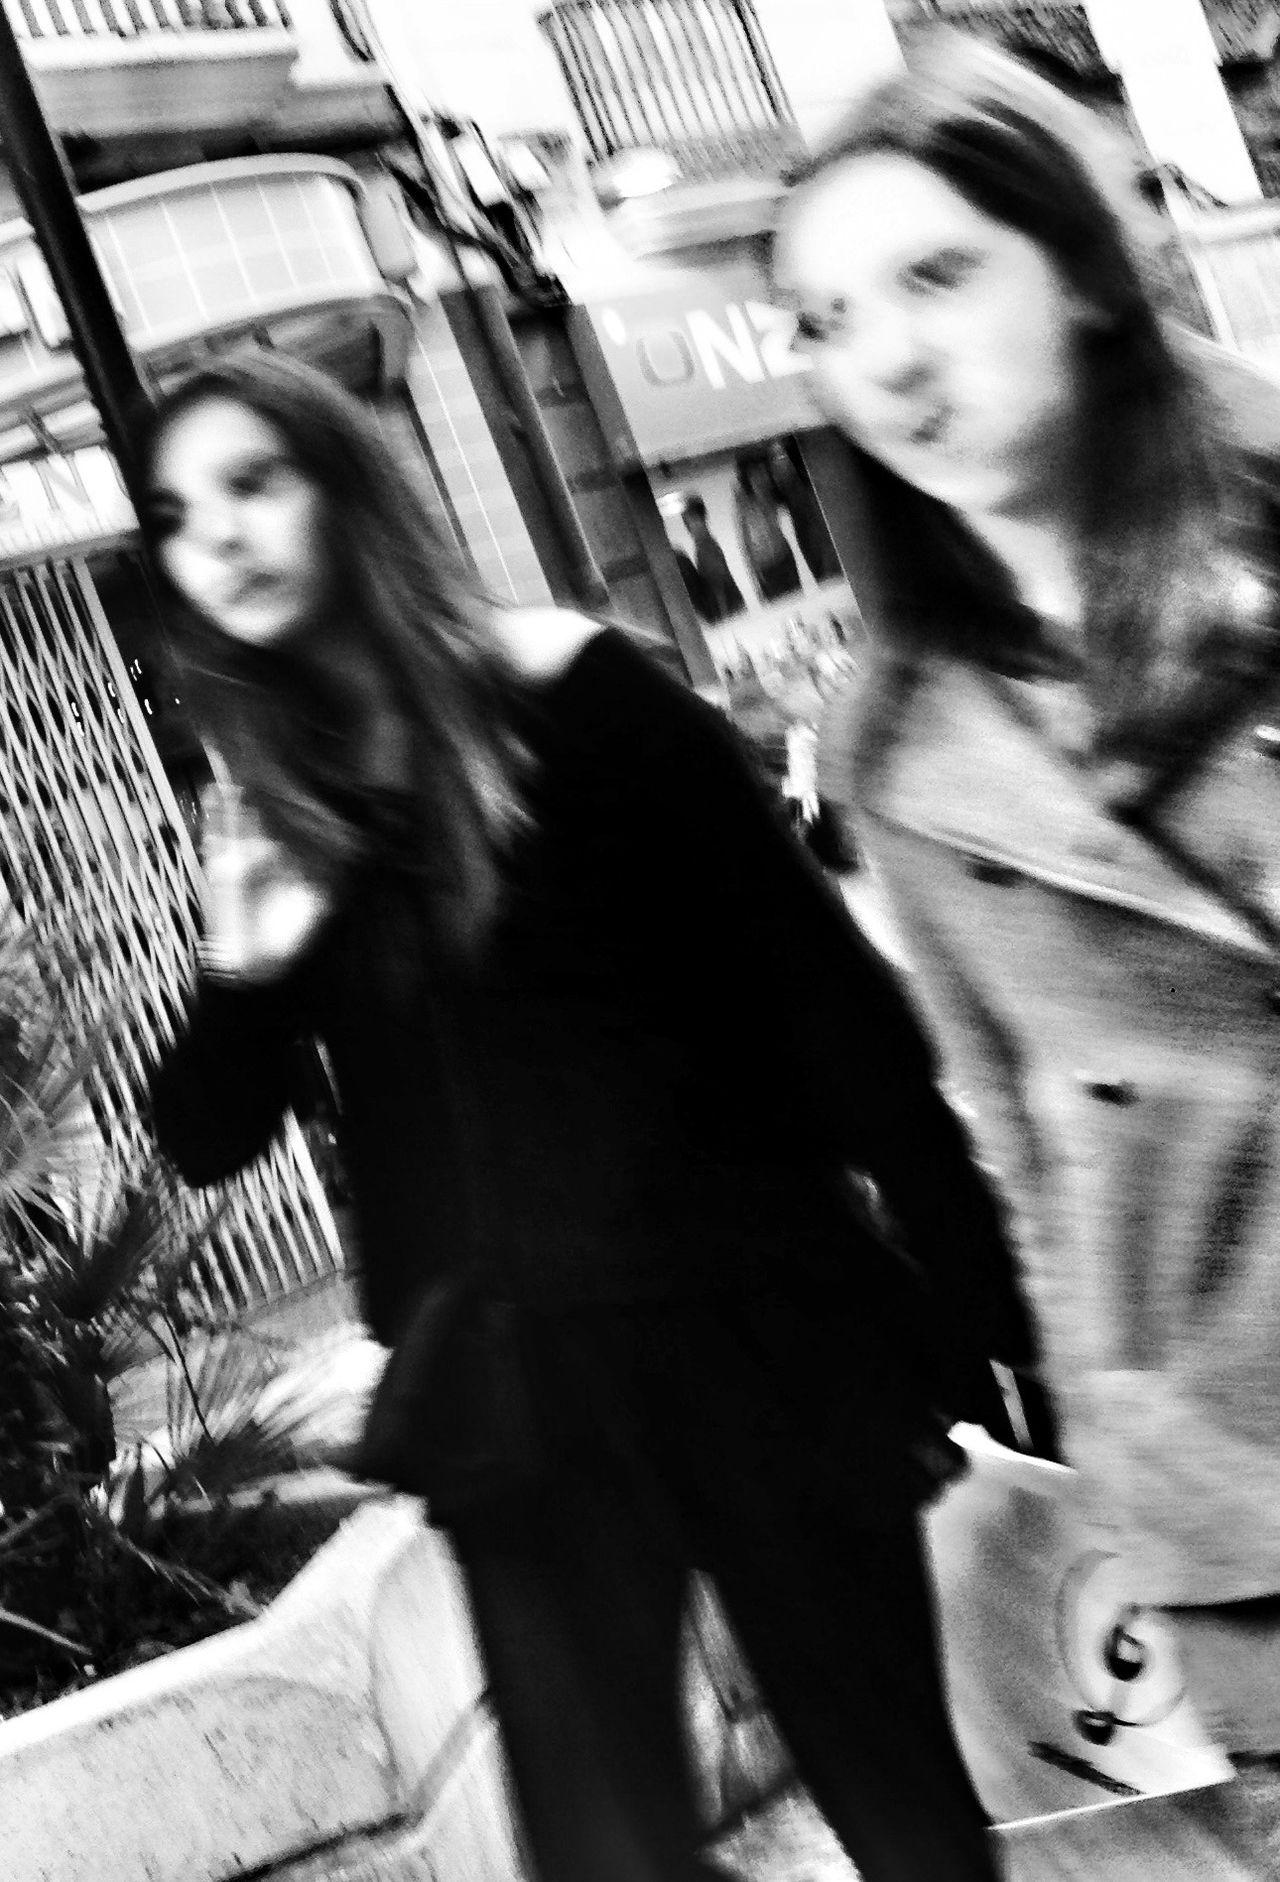 Blackandwhite Streetphotography Shootermag Street Portrait